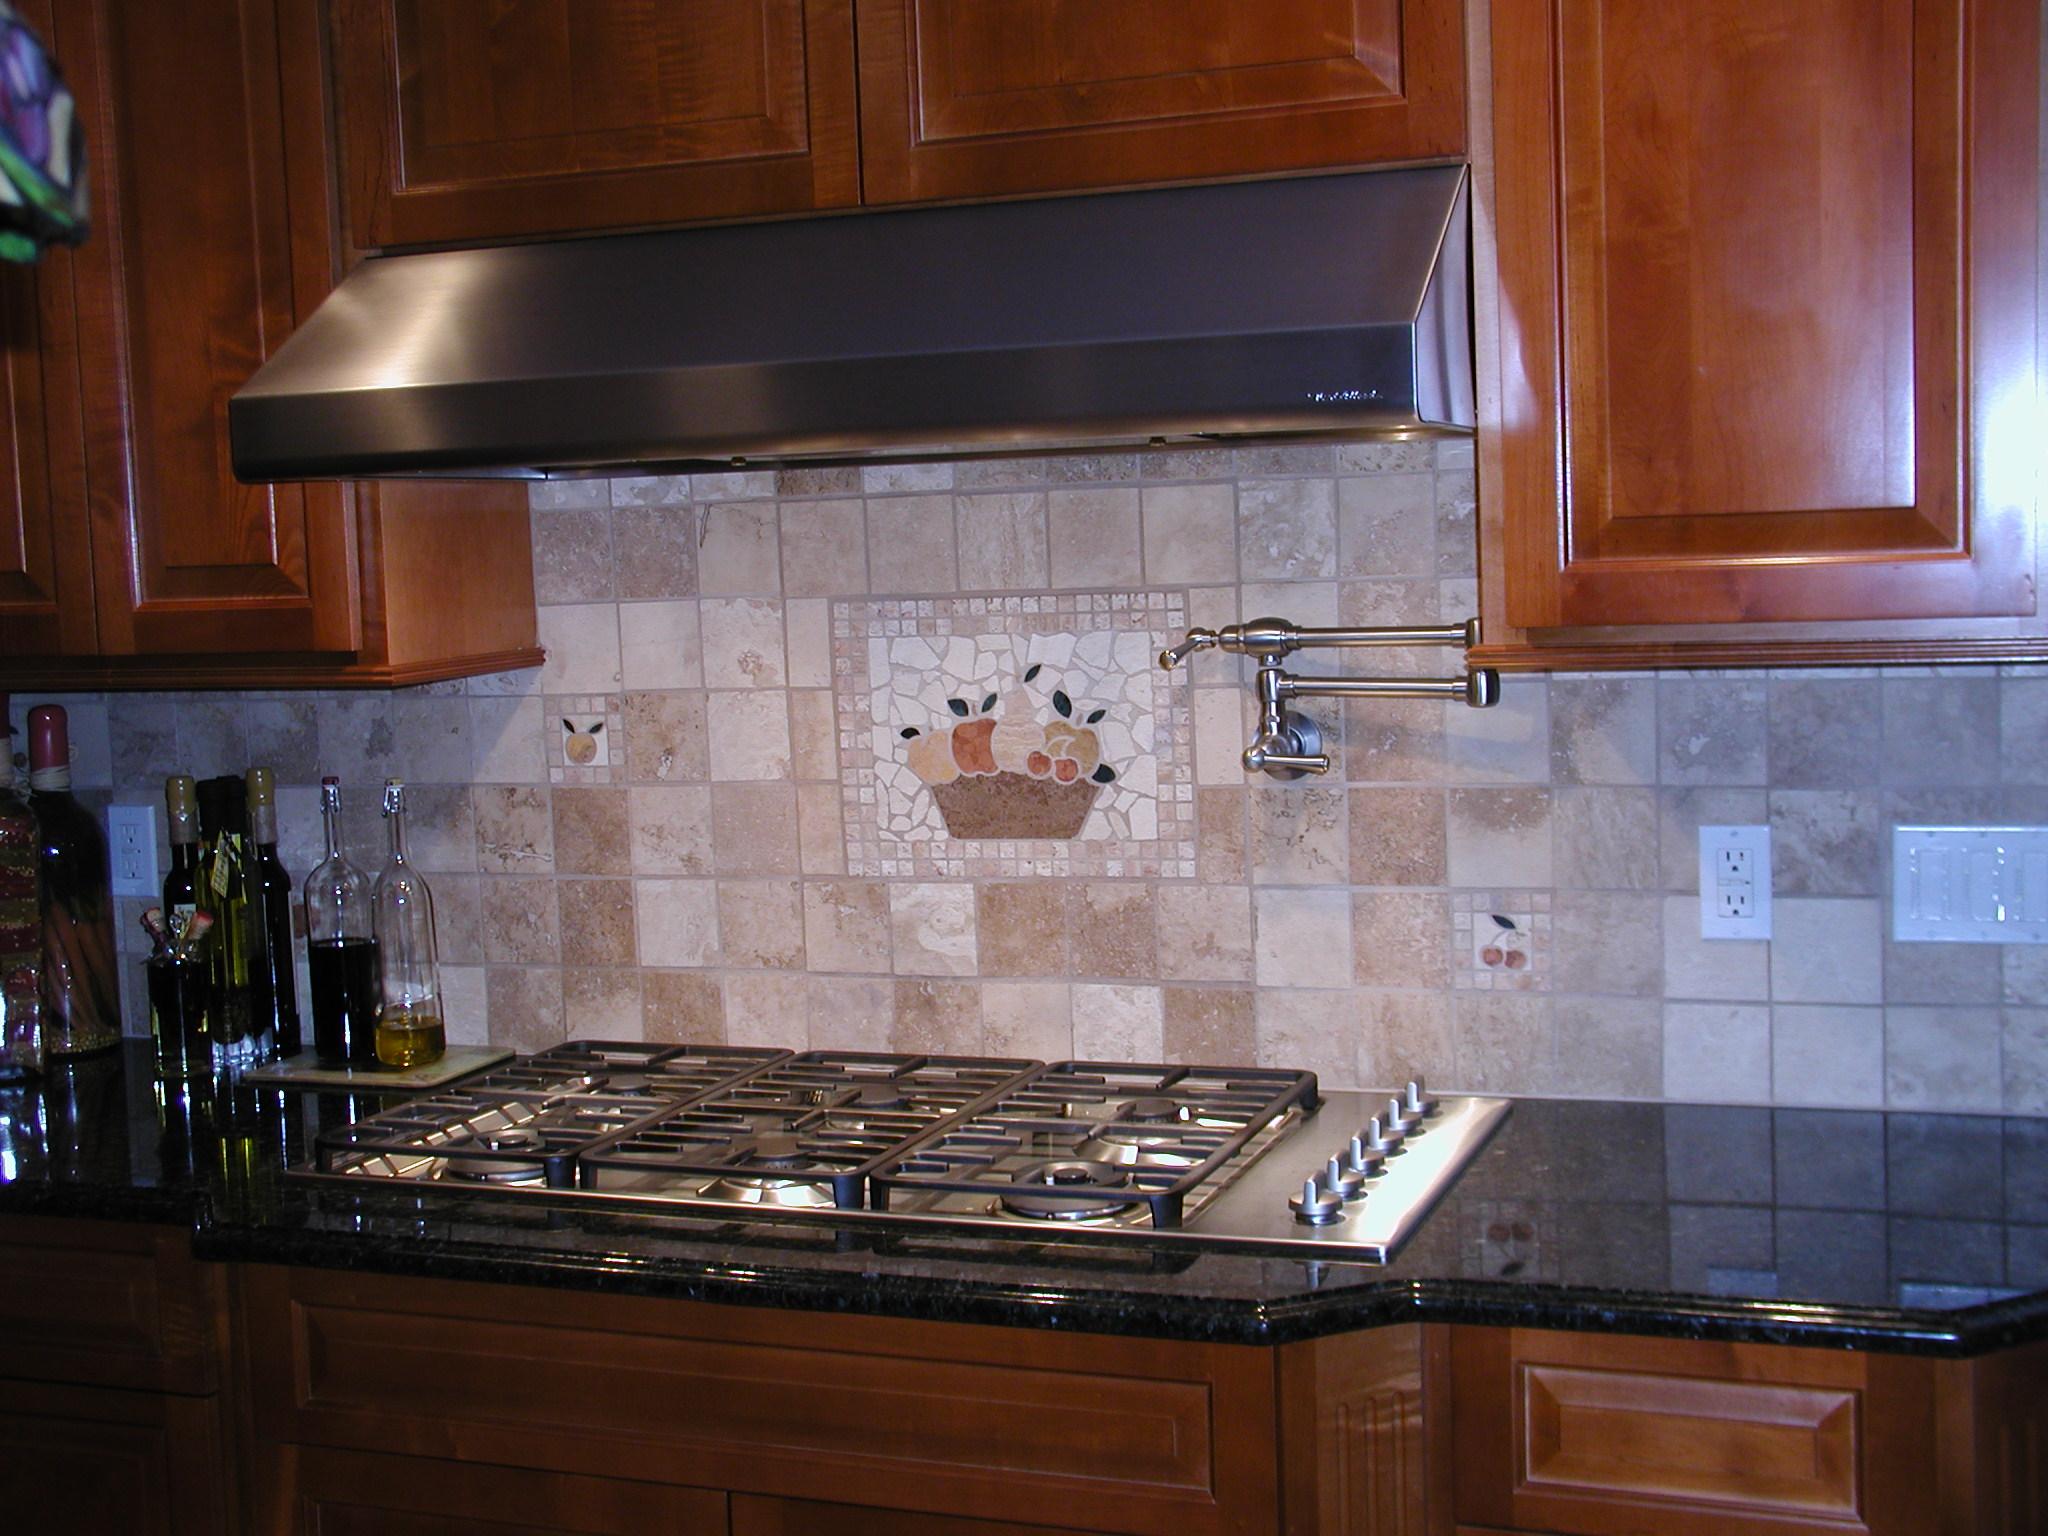 Modern Kitchen Tiles In Philippines 2048x1536 Wallpaper Teahub Io